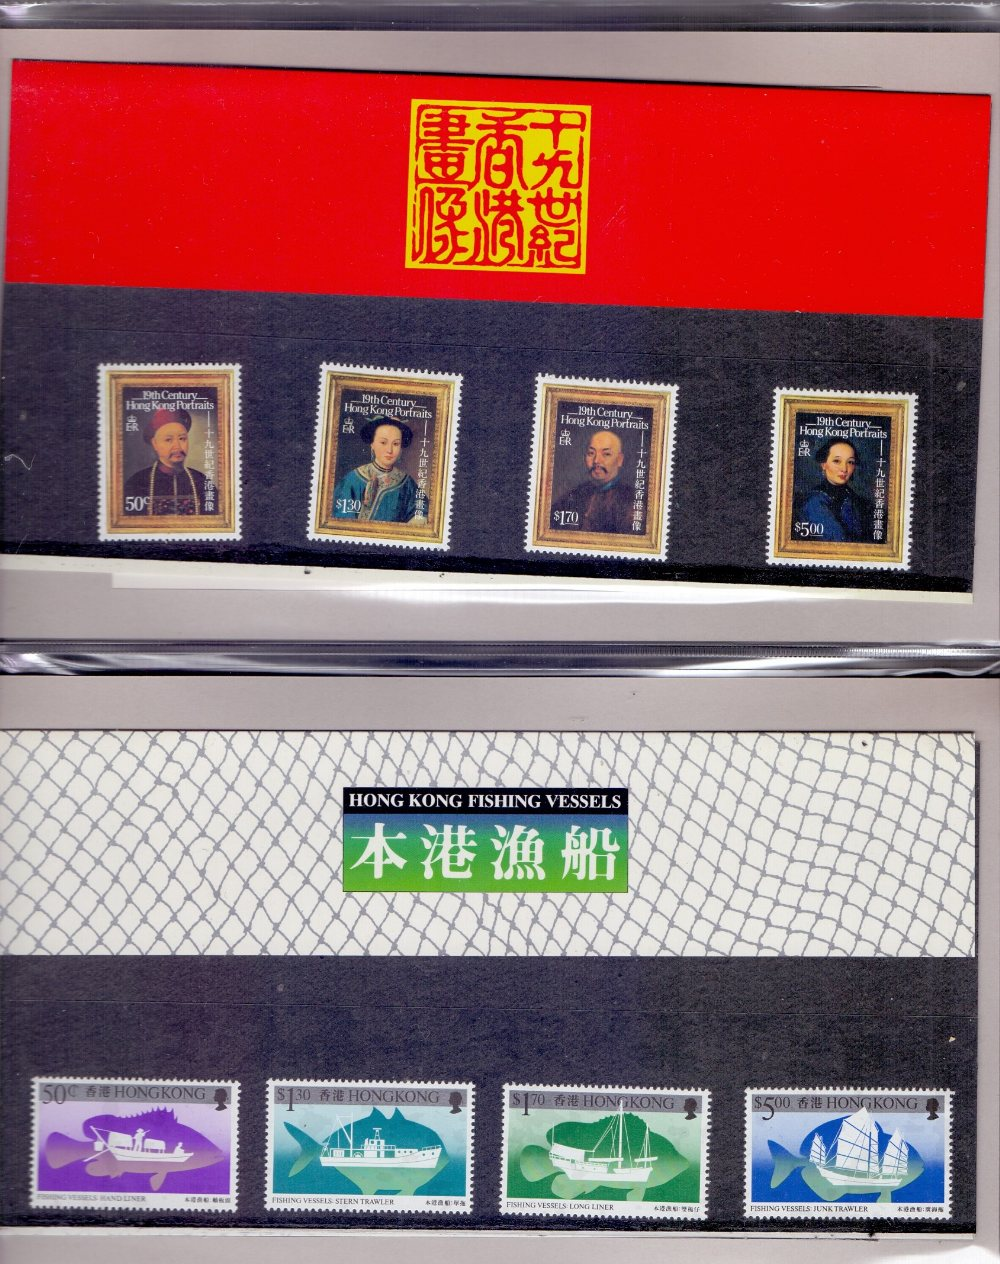 Lot 59 - STAMPS : Album of Hong Kong presentation packs 1987 to 92 period (35 packs) plus some Australia